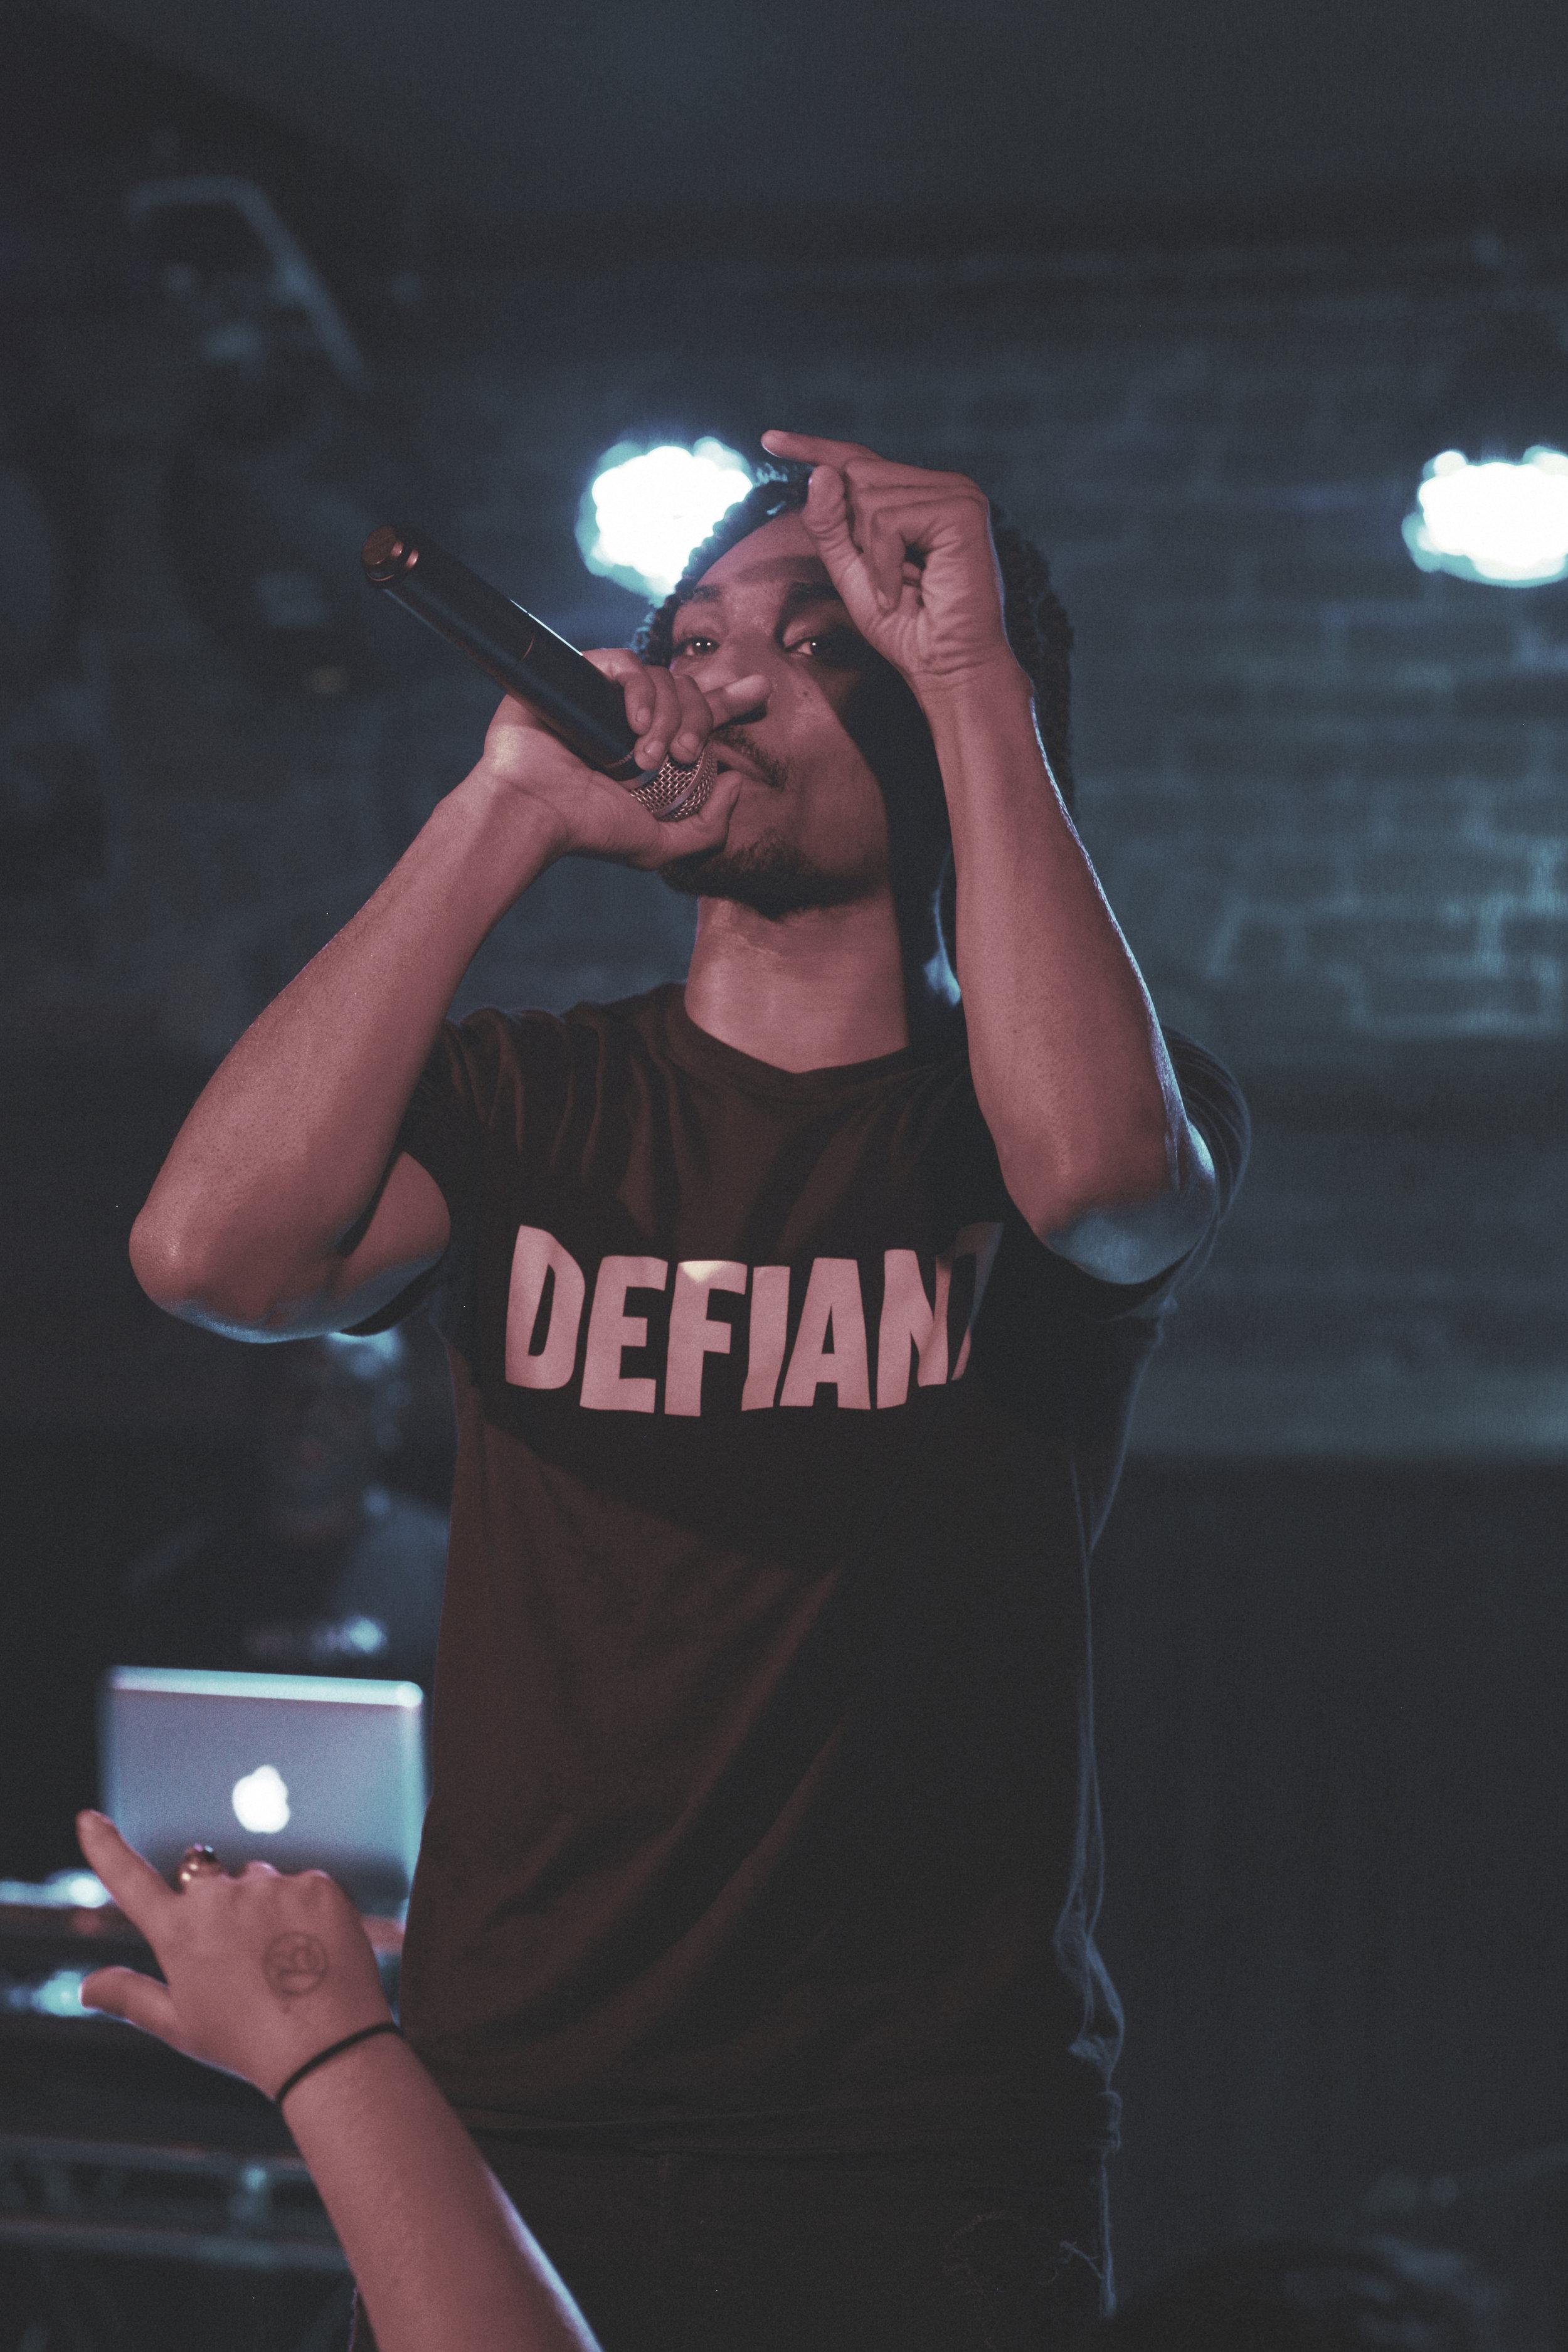 defiant.jpg